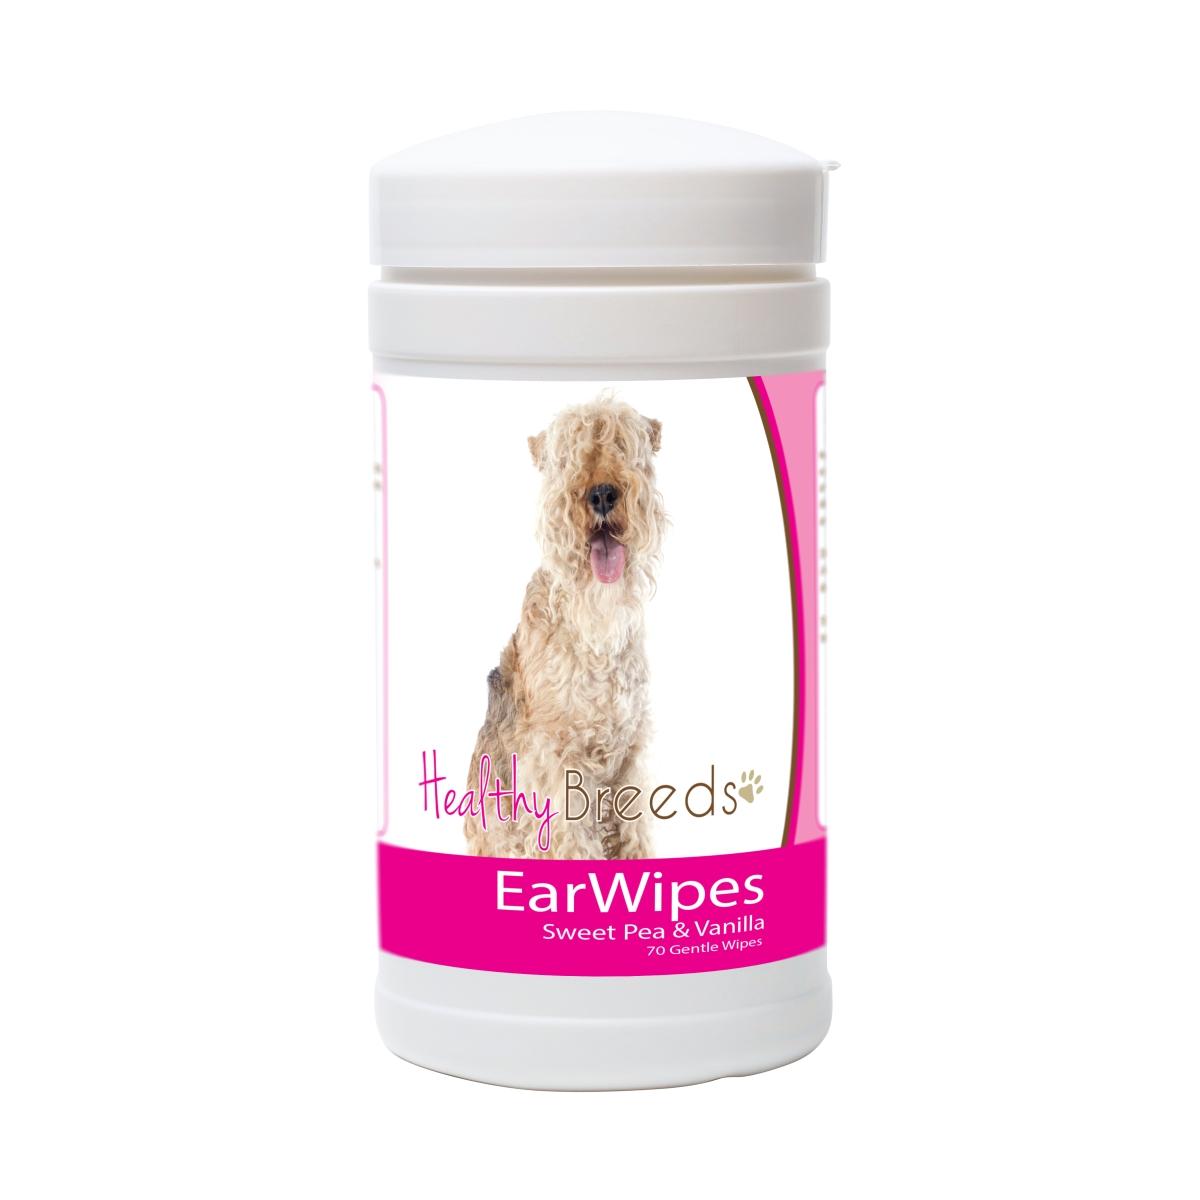 Healthy Breeds 840235175322 Lakeland Terrier Ear Wipes - 70 Count